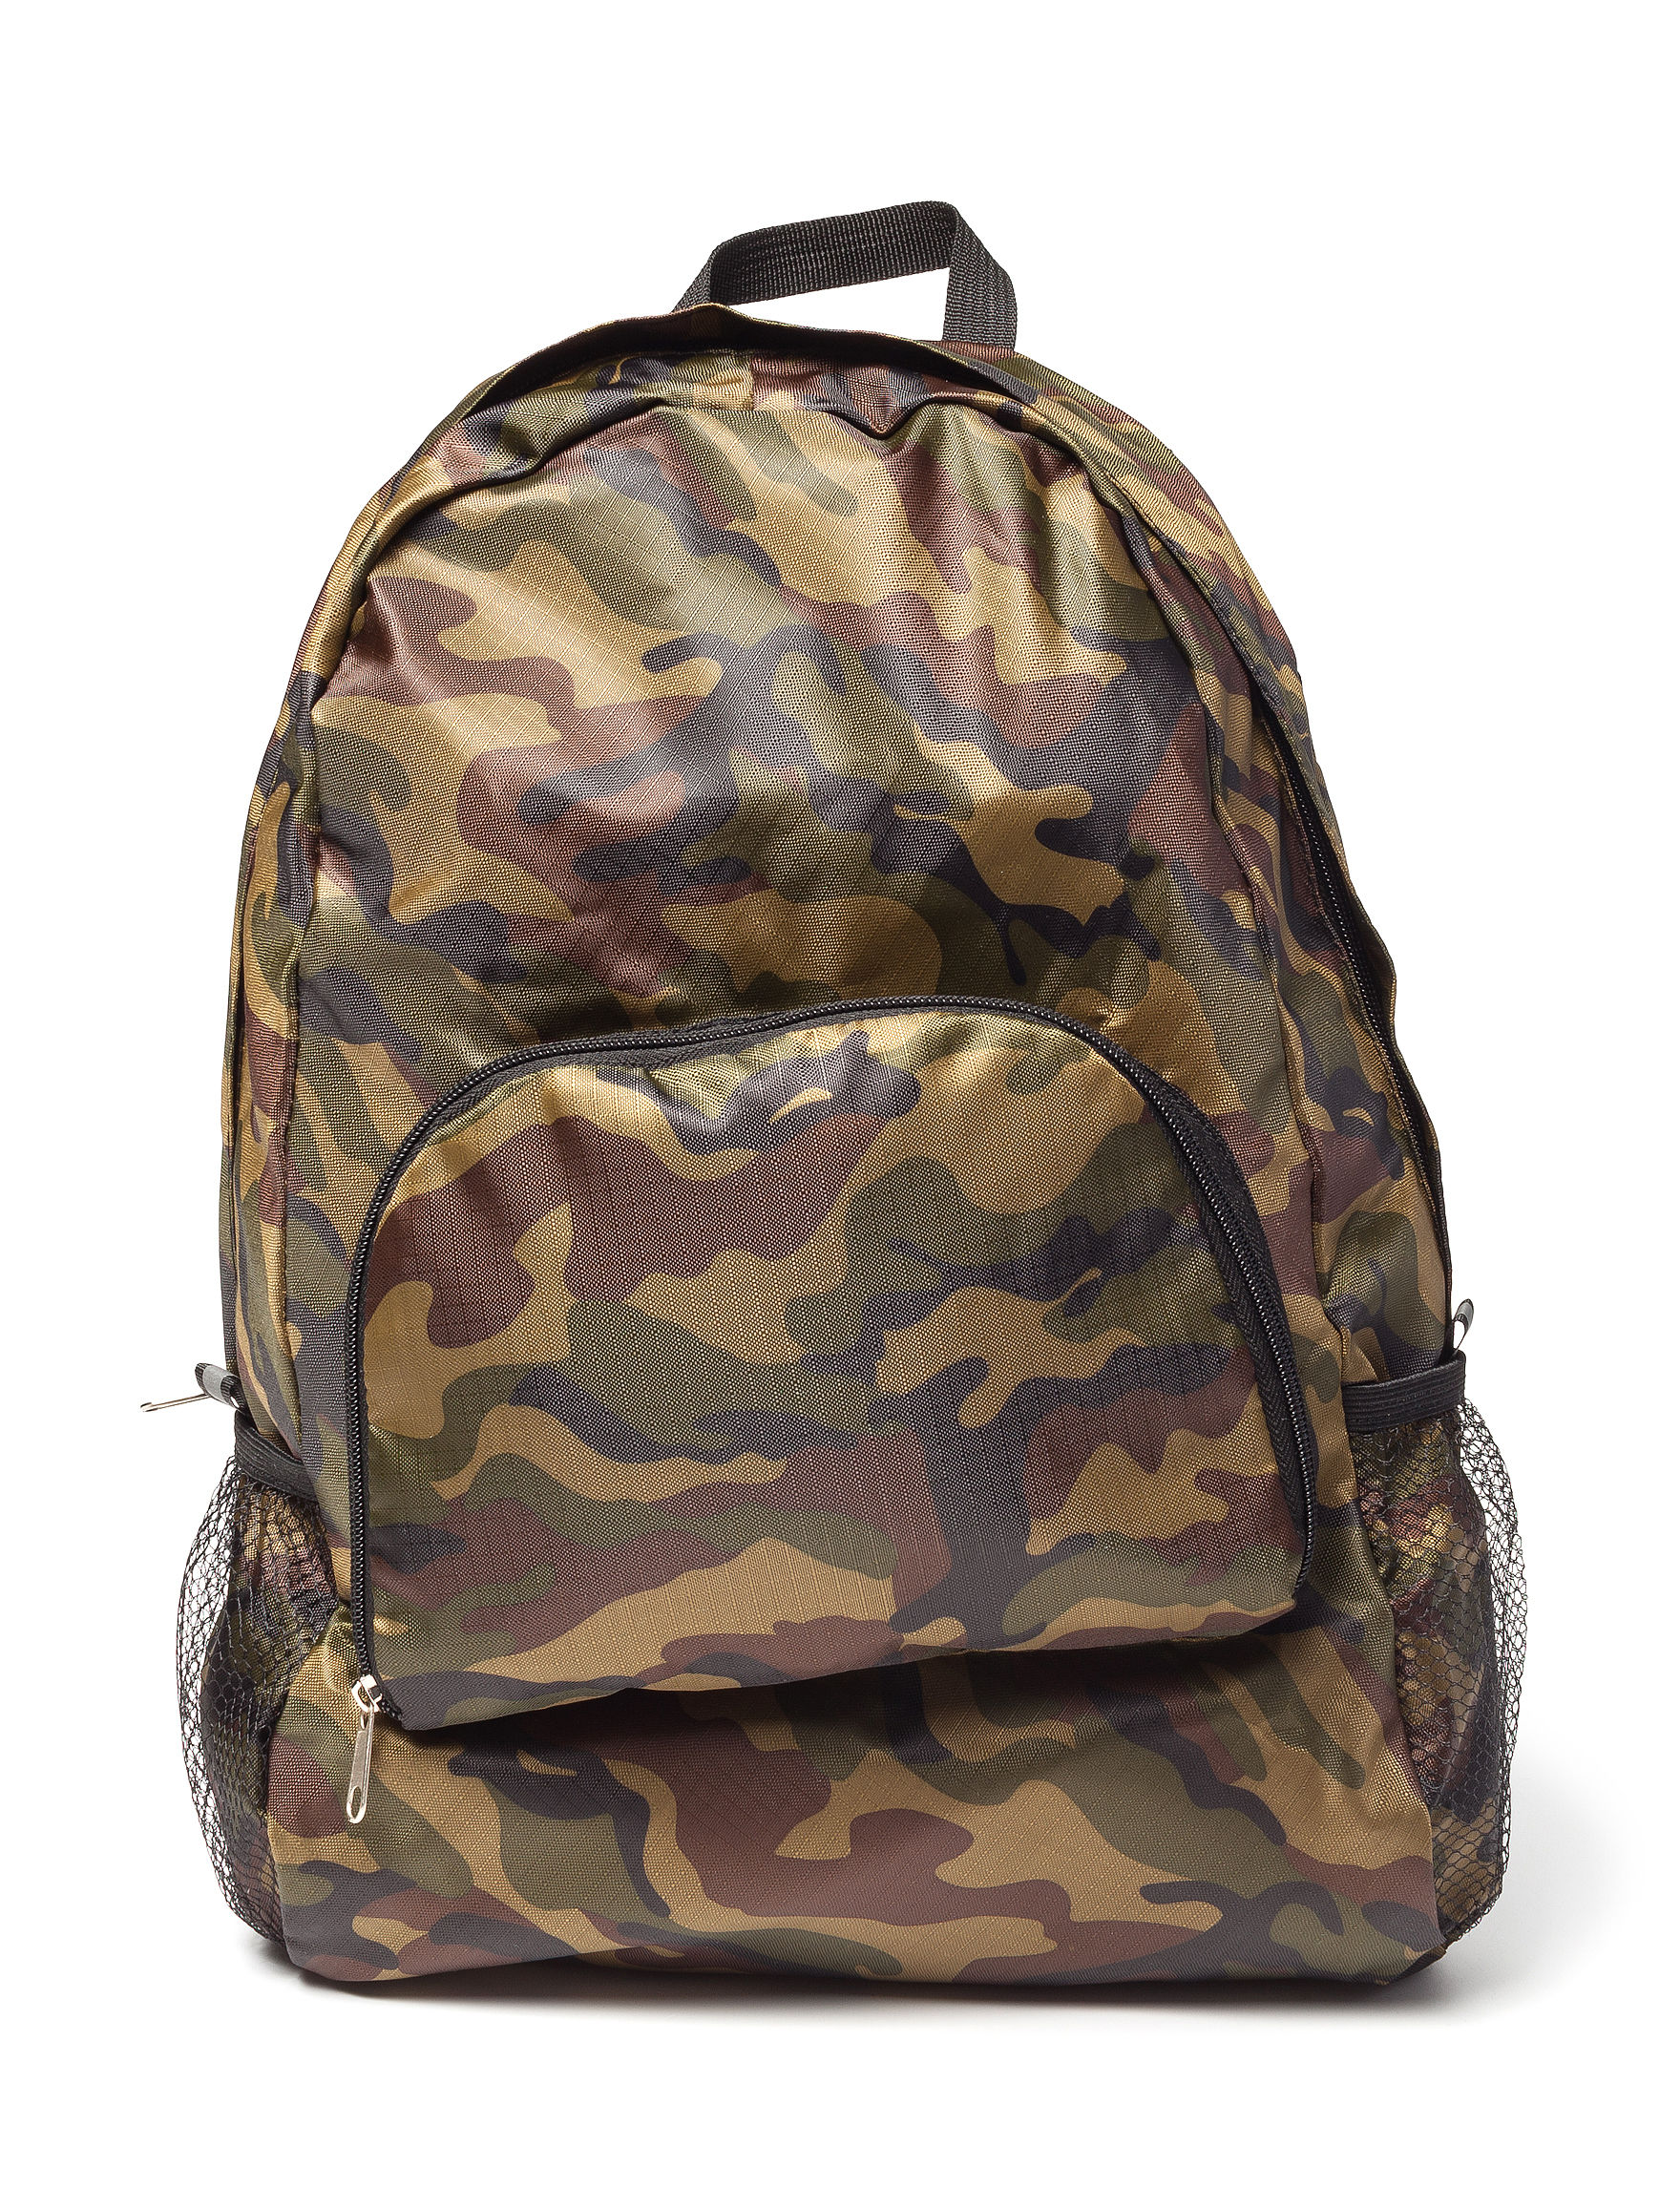 Nifty Camo Bookbags & Backpacks